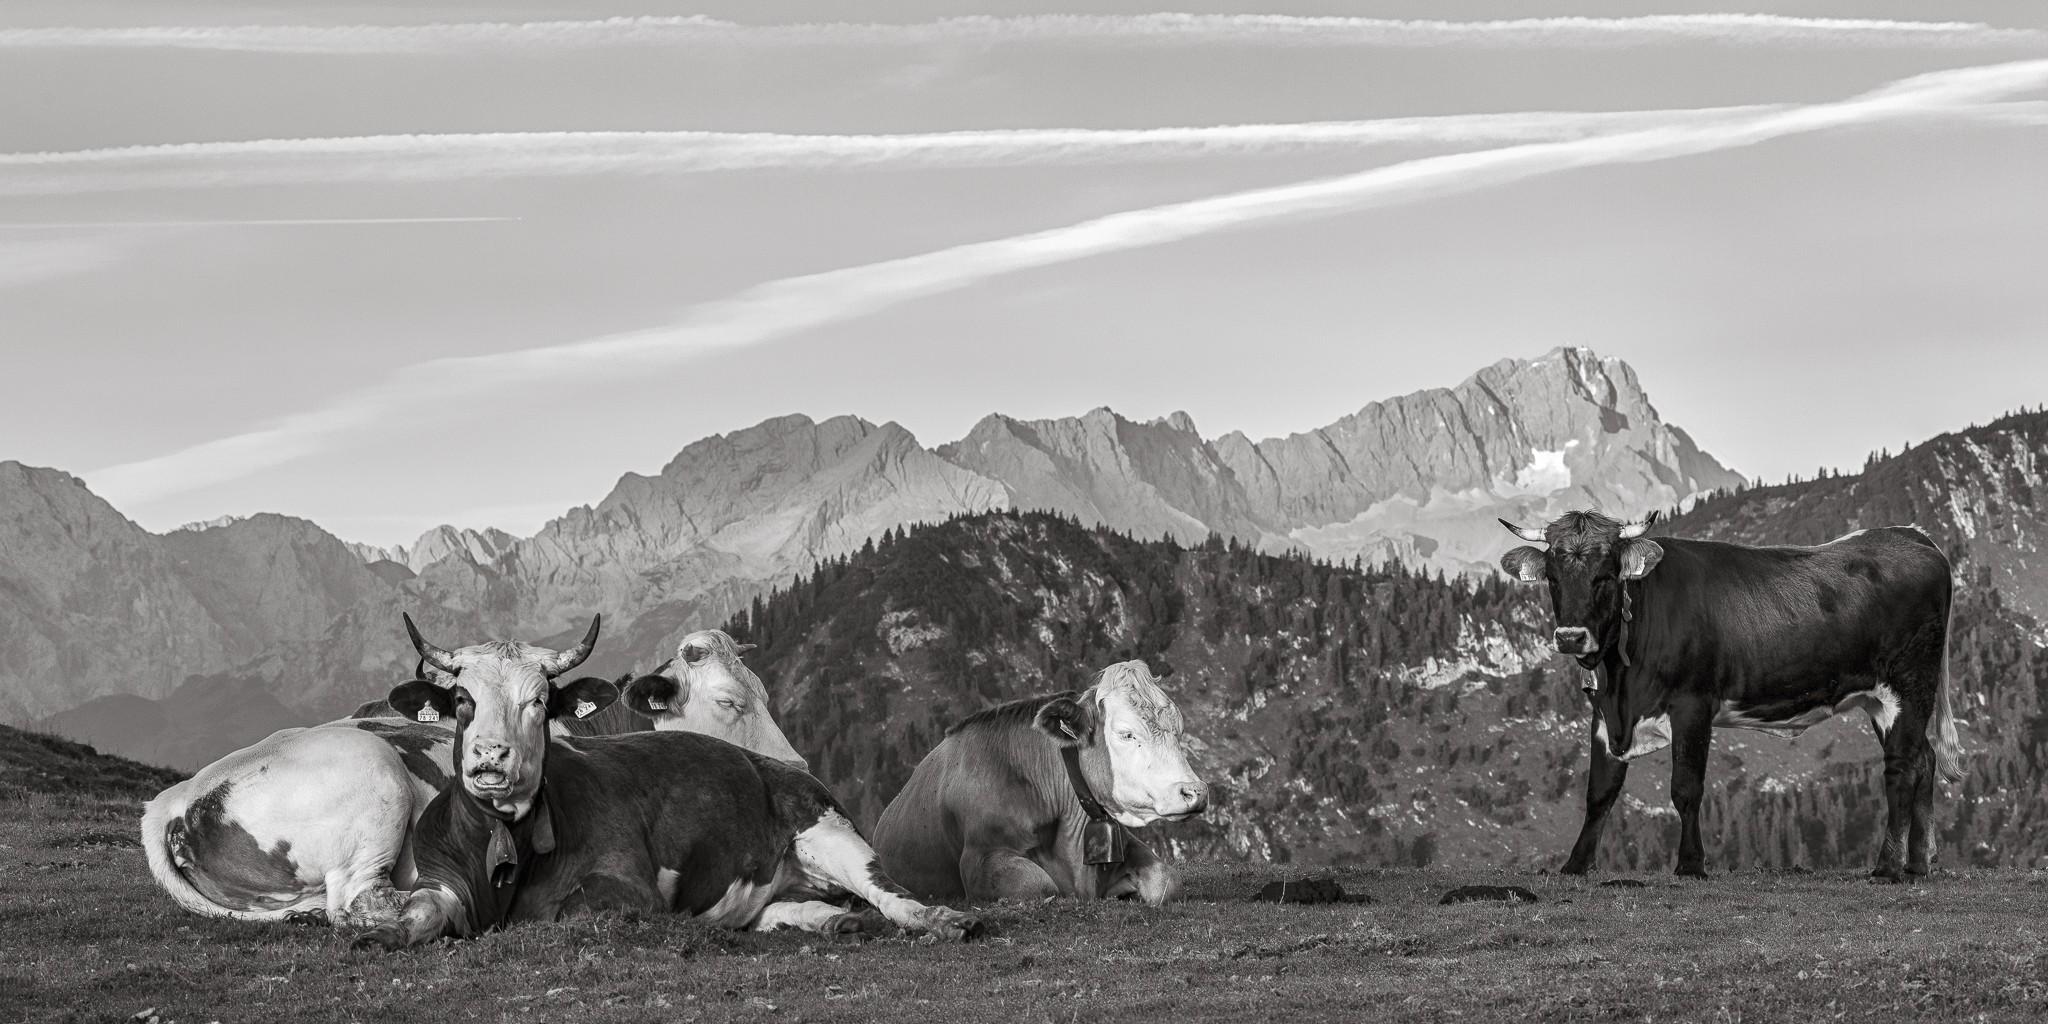 Zugspitze Kälber - Morgenruhe. Kühe auf der Alm - Simetsberg